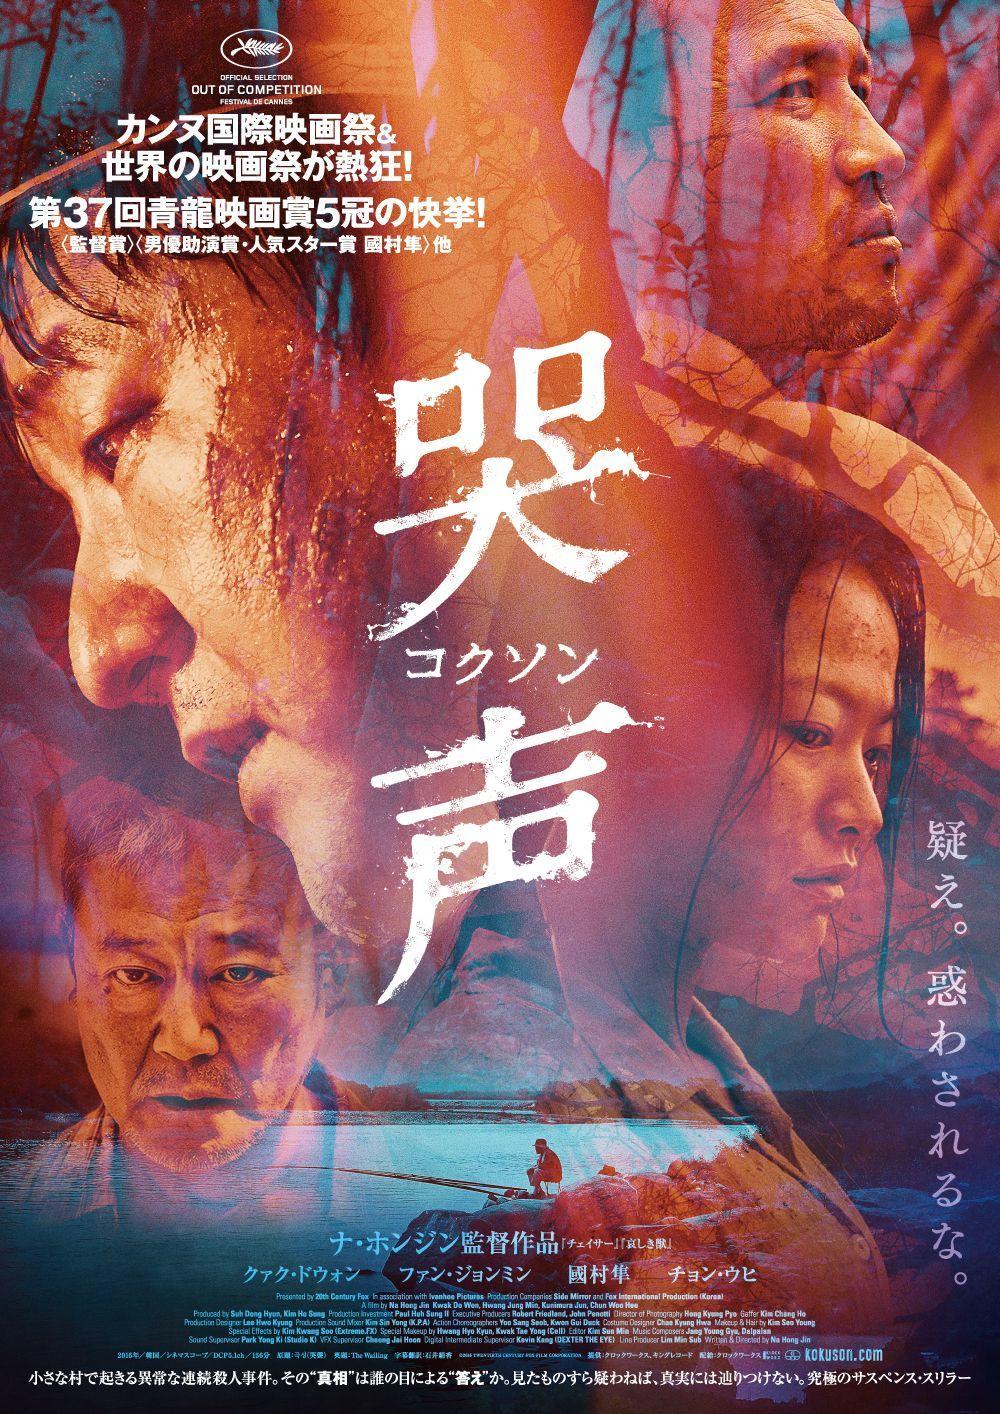 (C)2016 TWENTIETH CENTURY FOX FILM CORPORATION